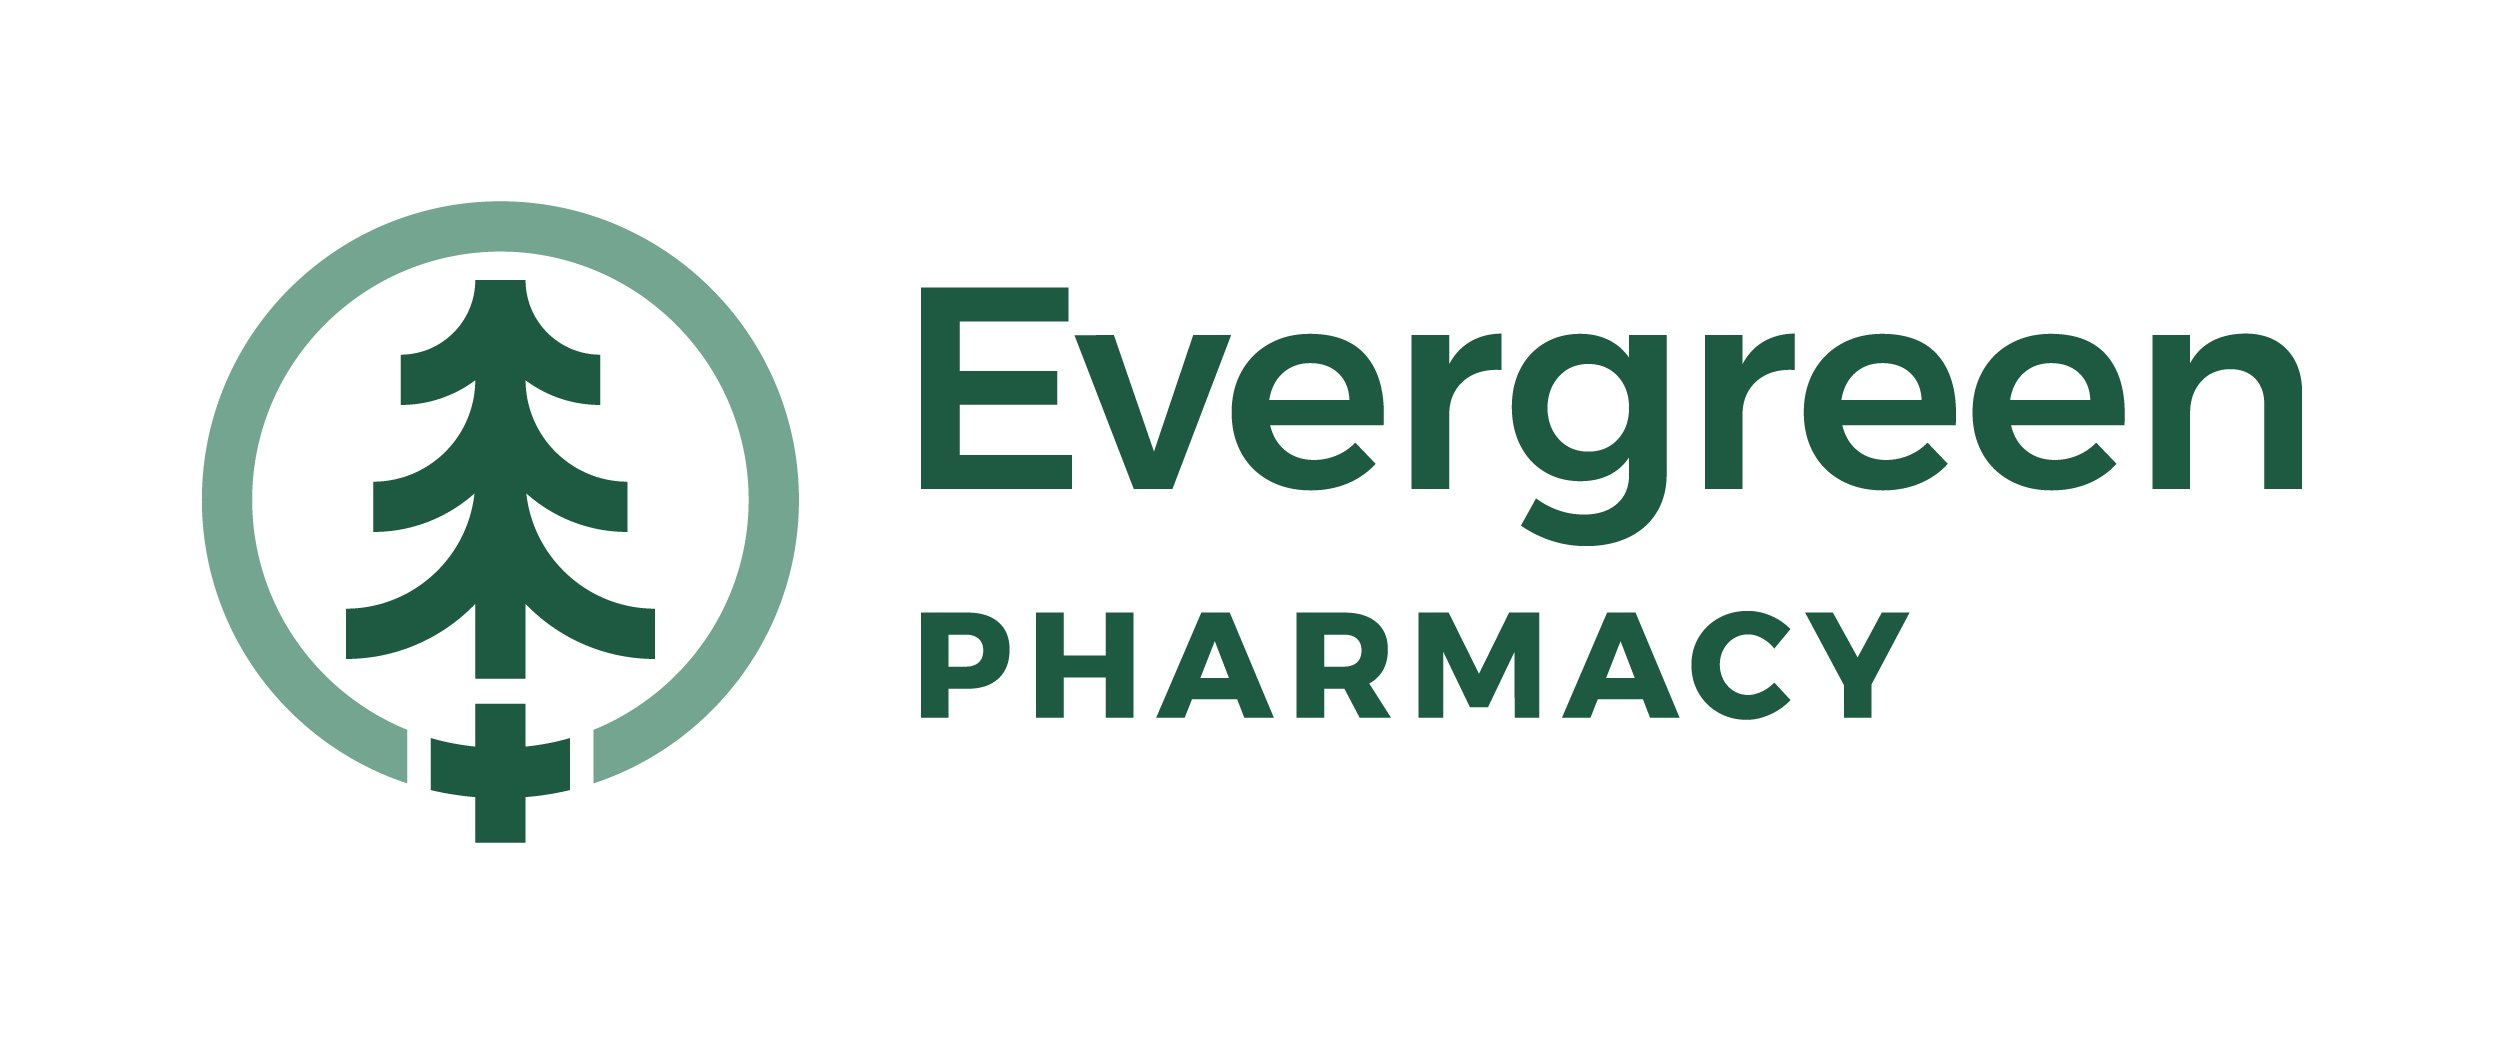 Evergreen Pharmacy Logo